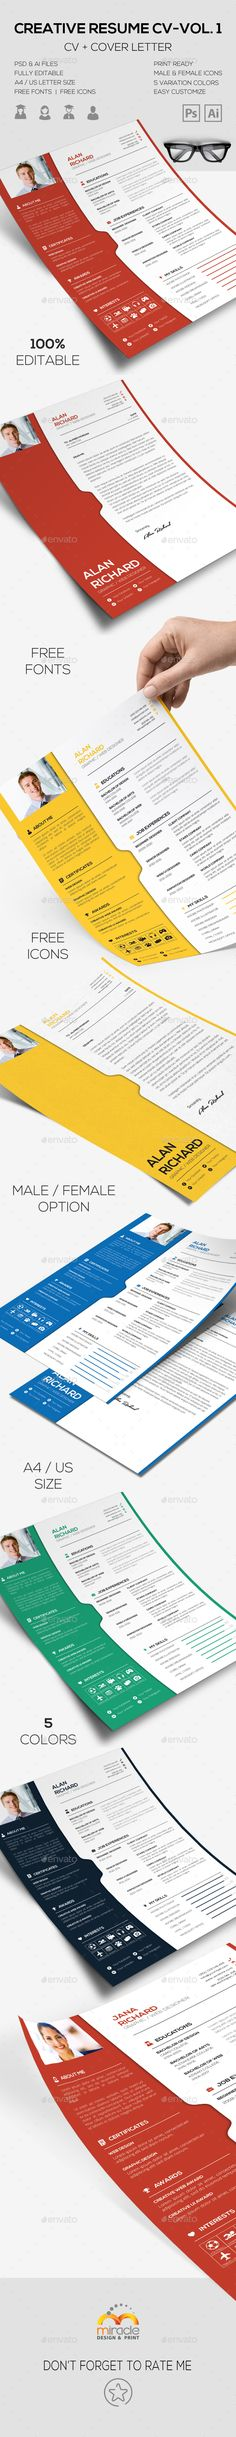 Resume / CV Template Cv template, Resume cv and Simple resume template